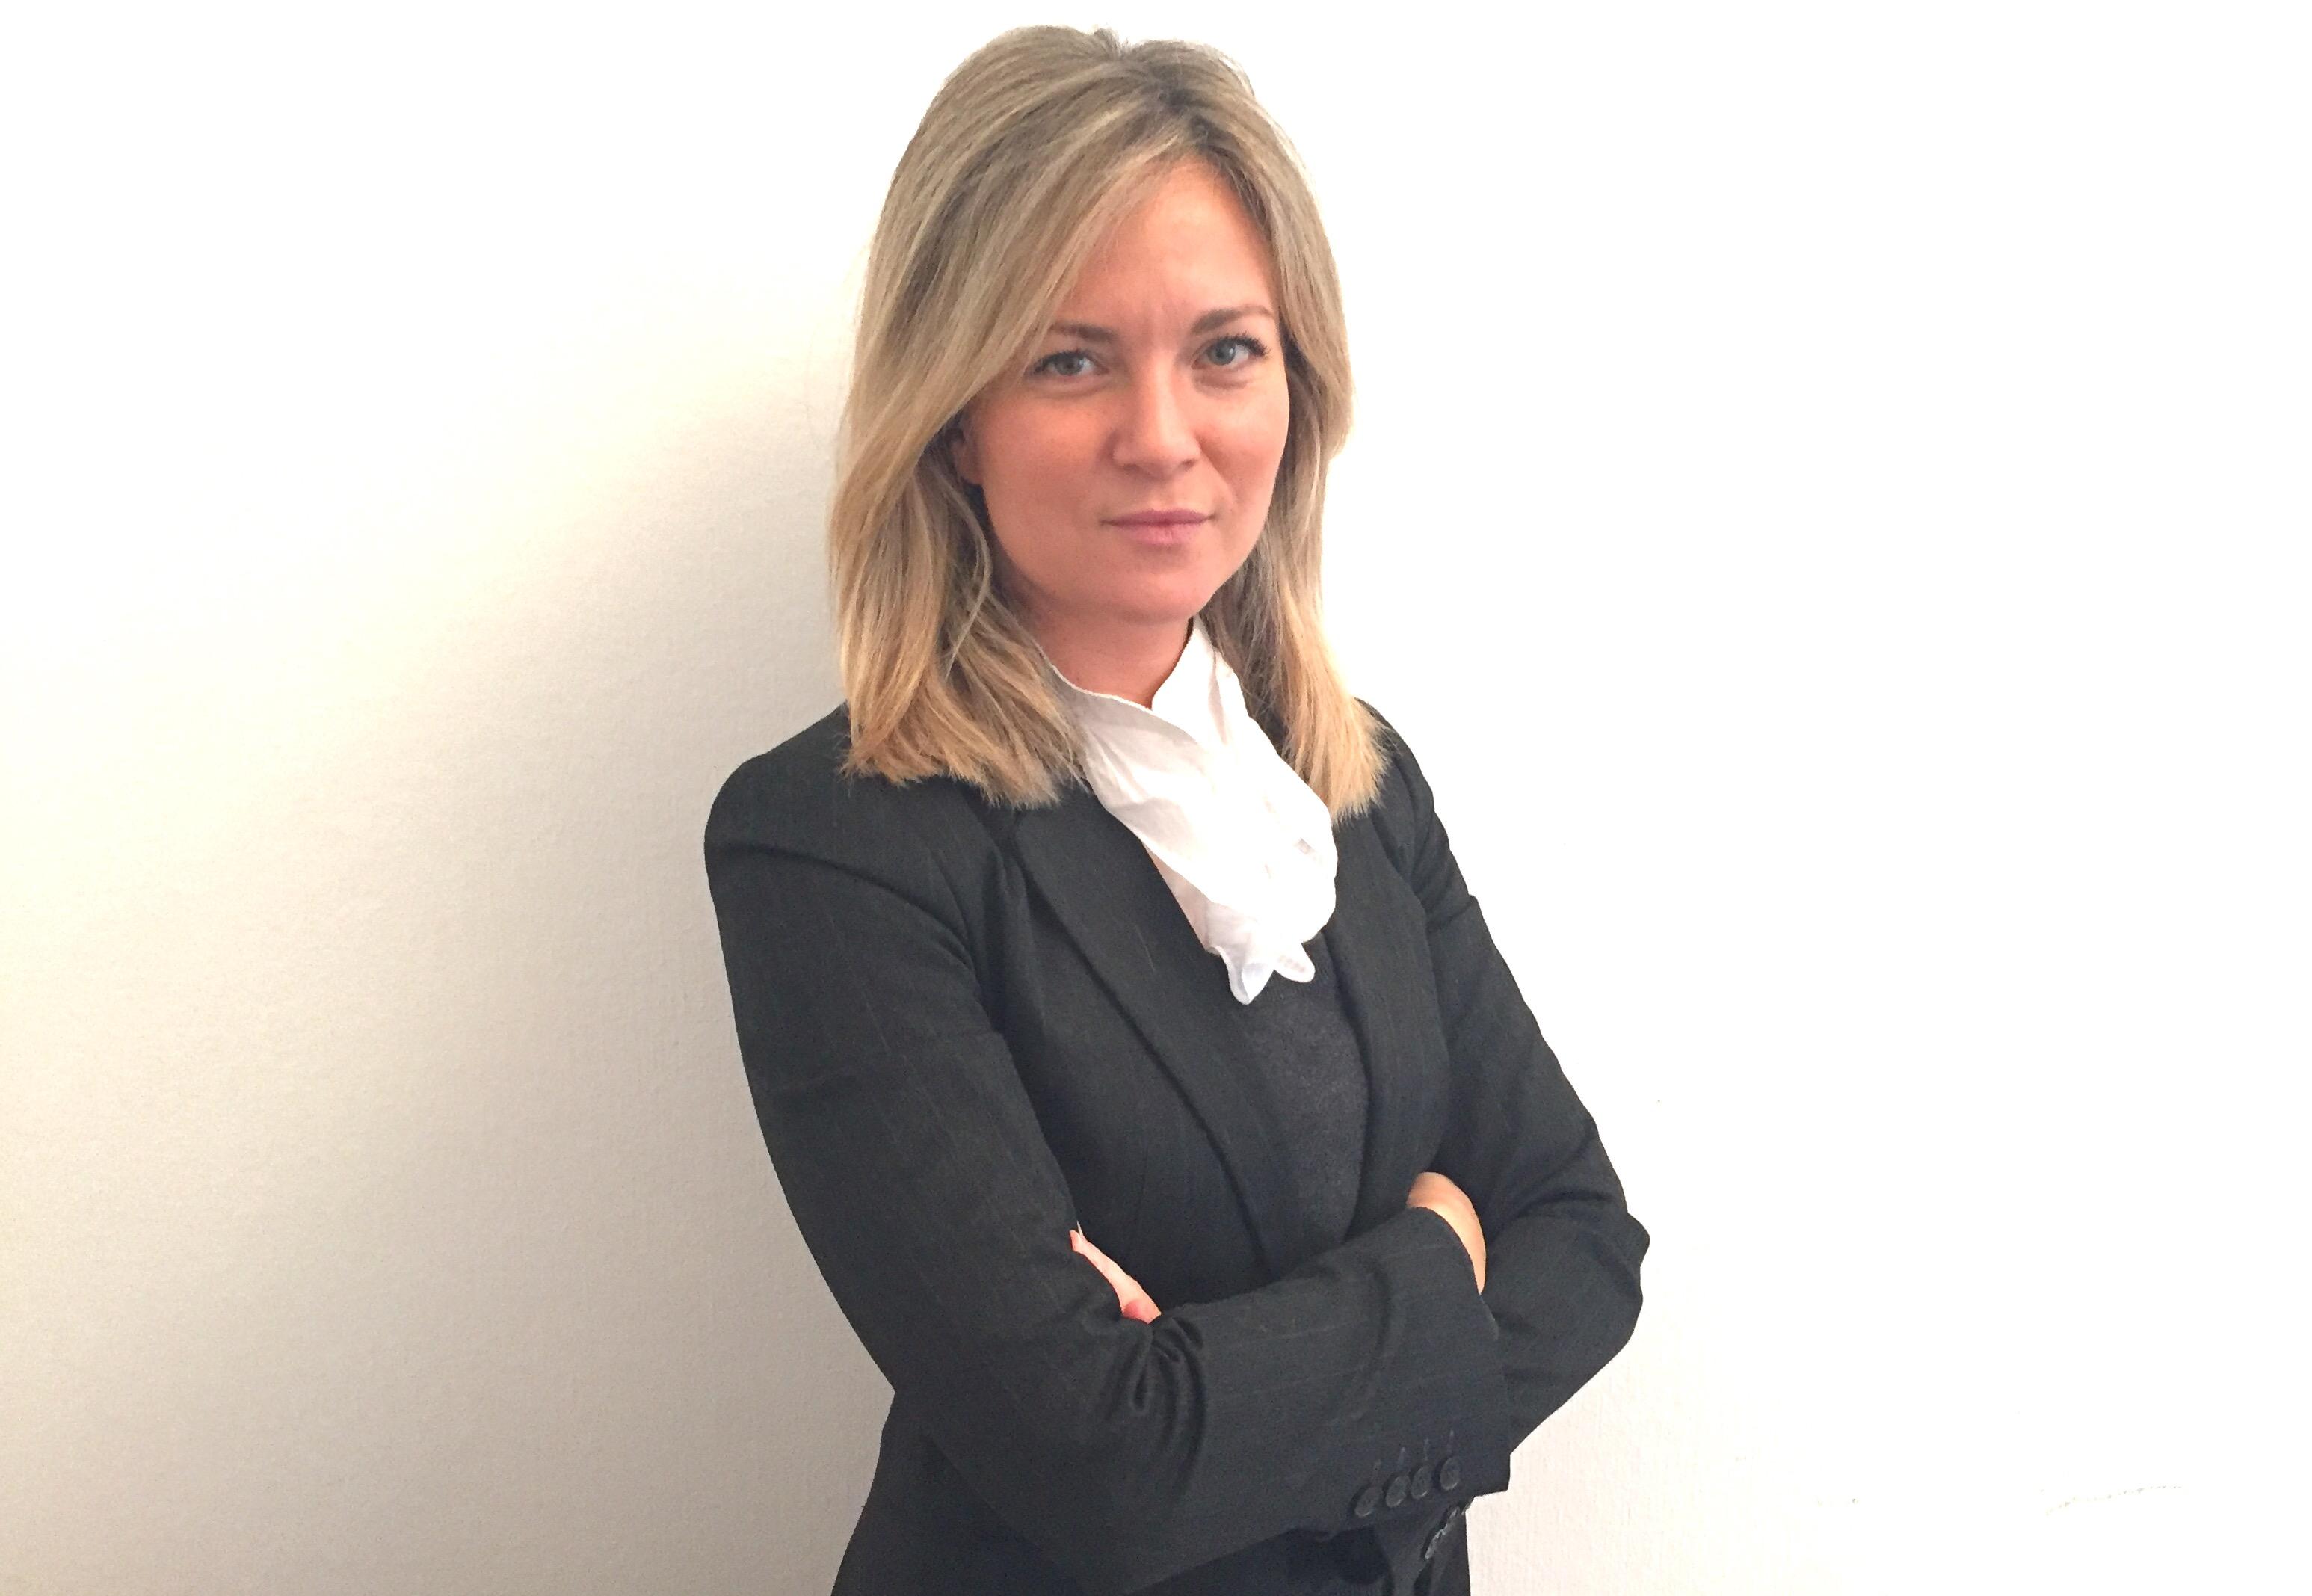 Paola Trecarichi